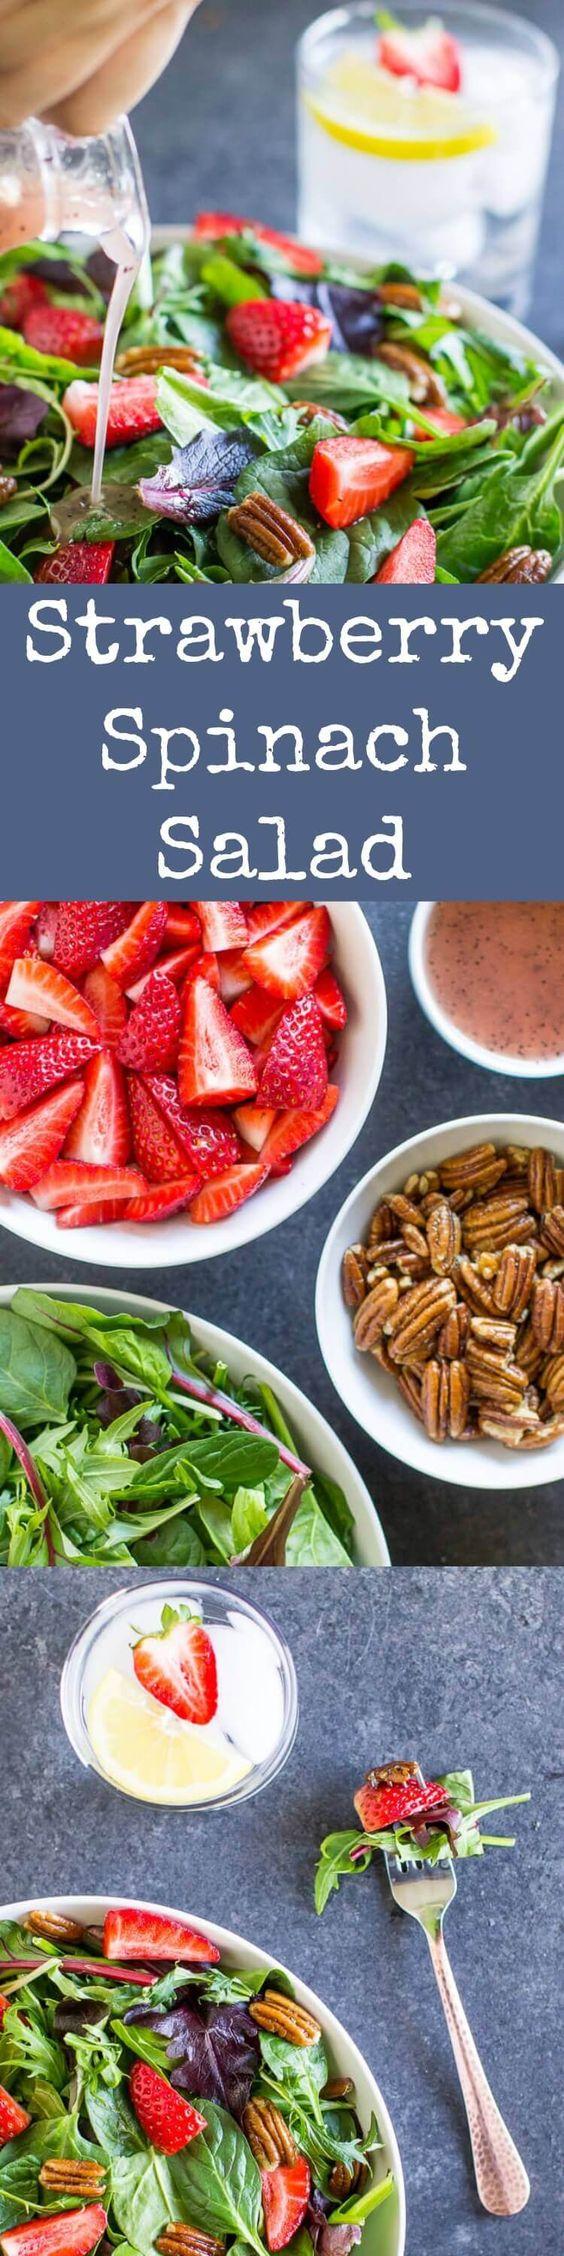 PC:http://www.culinaryhill.com/strawberry-pecan-spinach-salad/